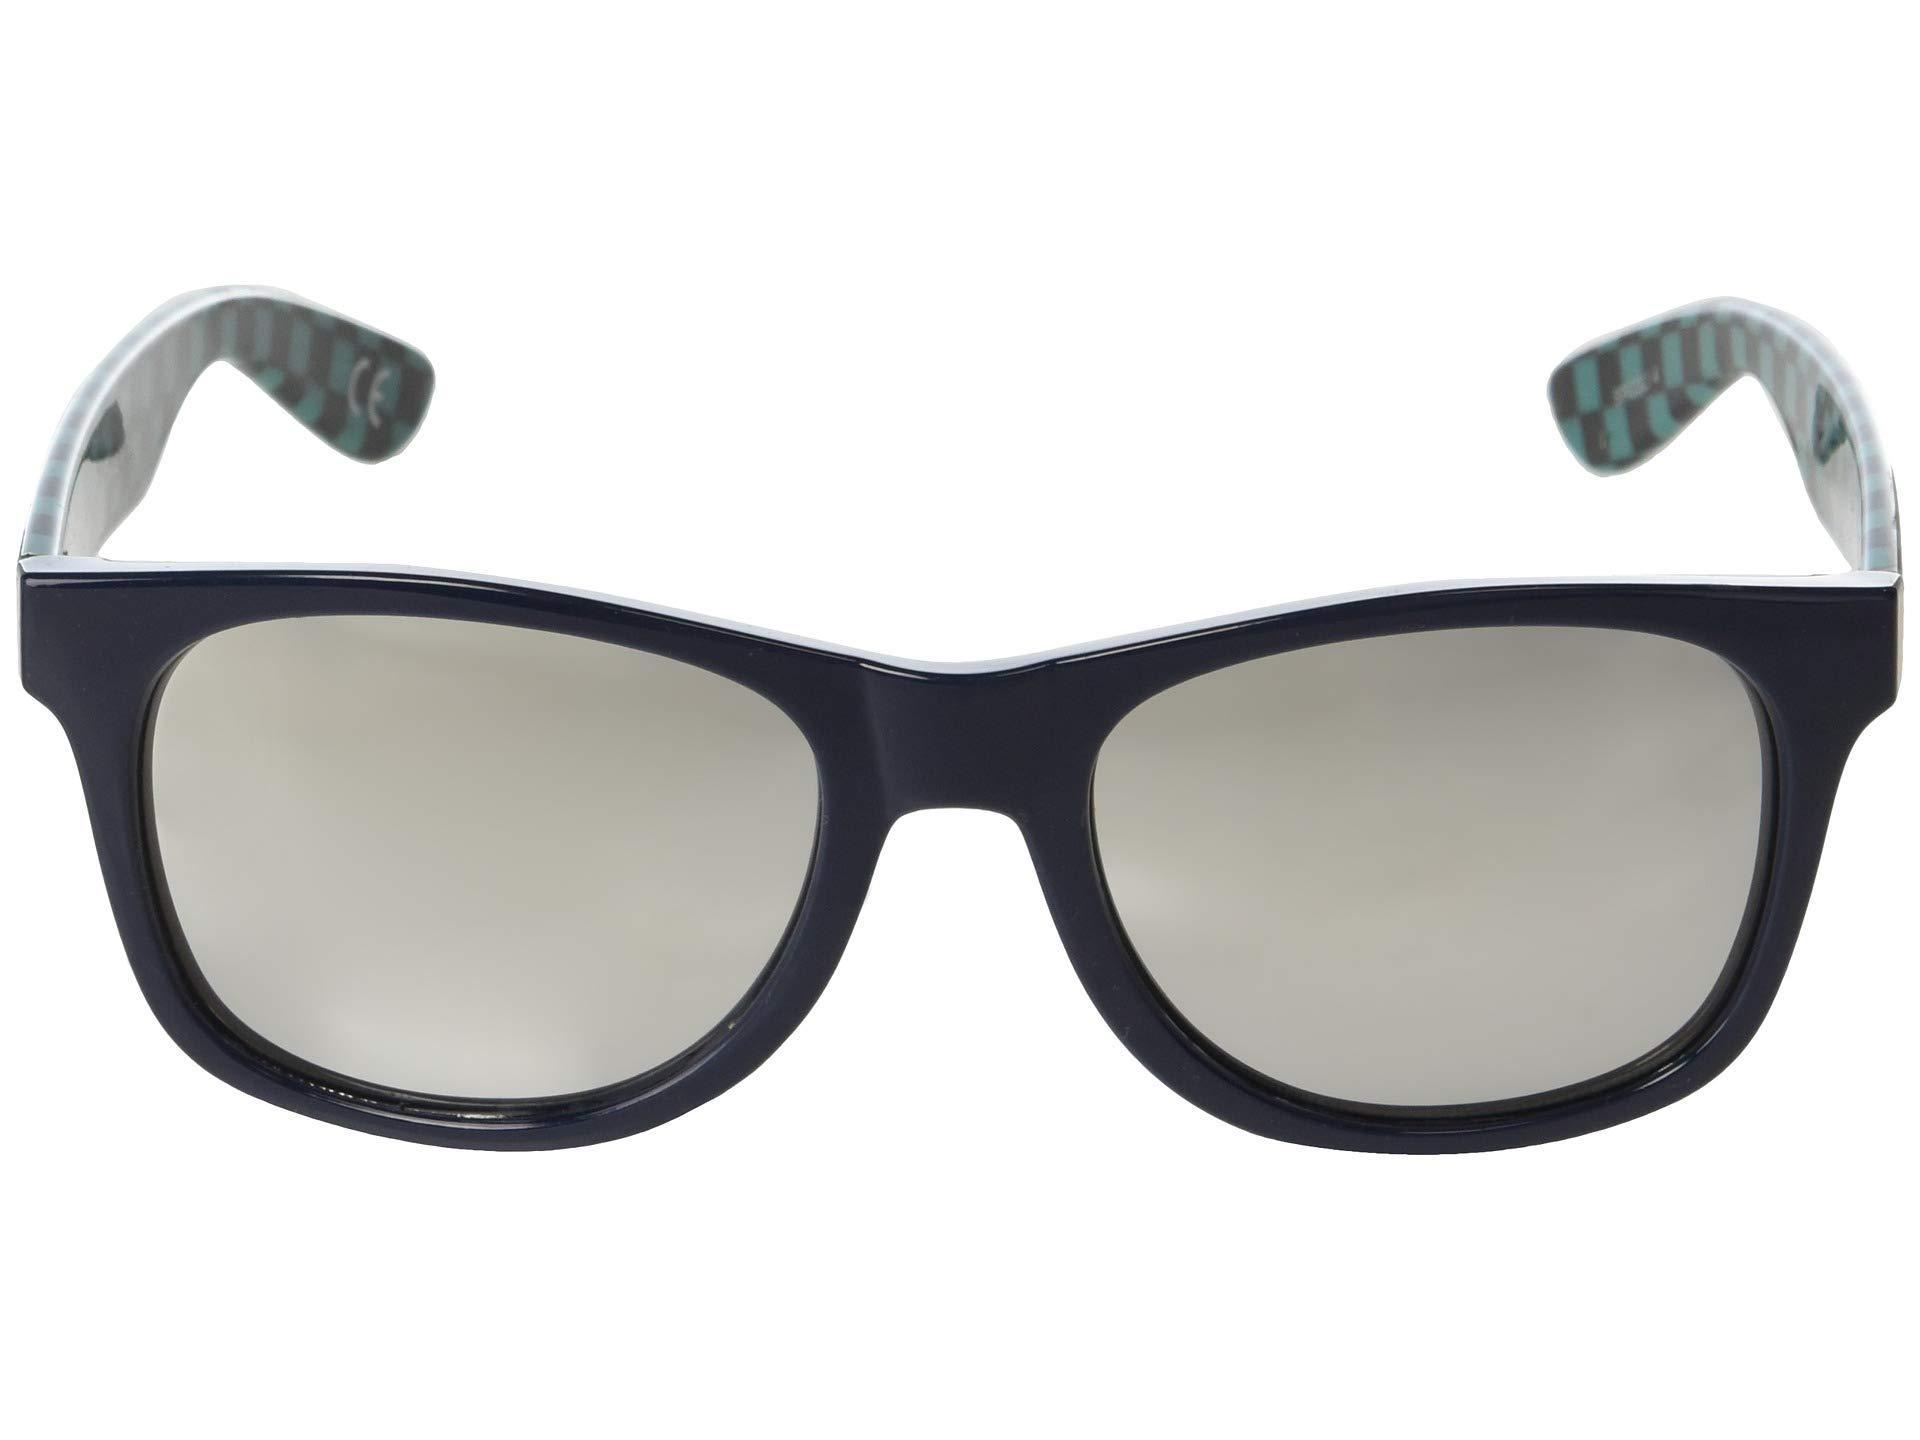 a6184a1b99a Vans - Spicoli 4 Shades (black white) Fashion Sunglasses for Men - Lyst.  View fullscreen